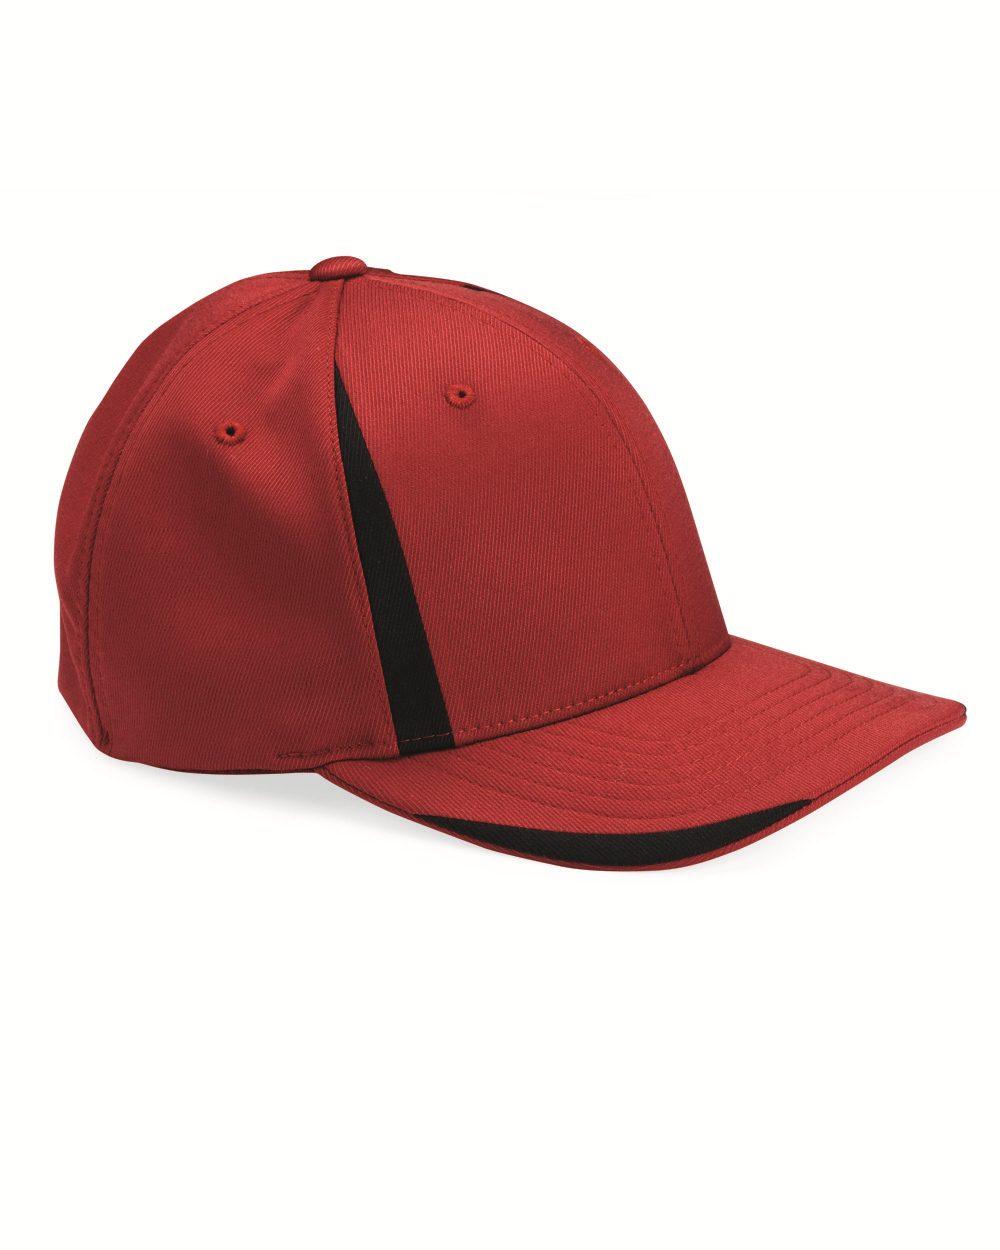 Flexfit Cool & Dry Double Twill Cap - 6599